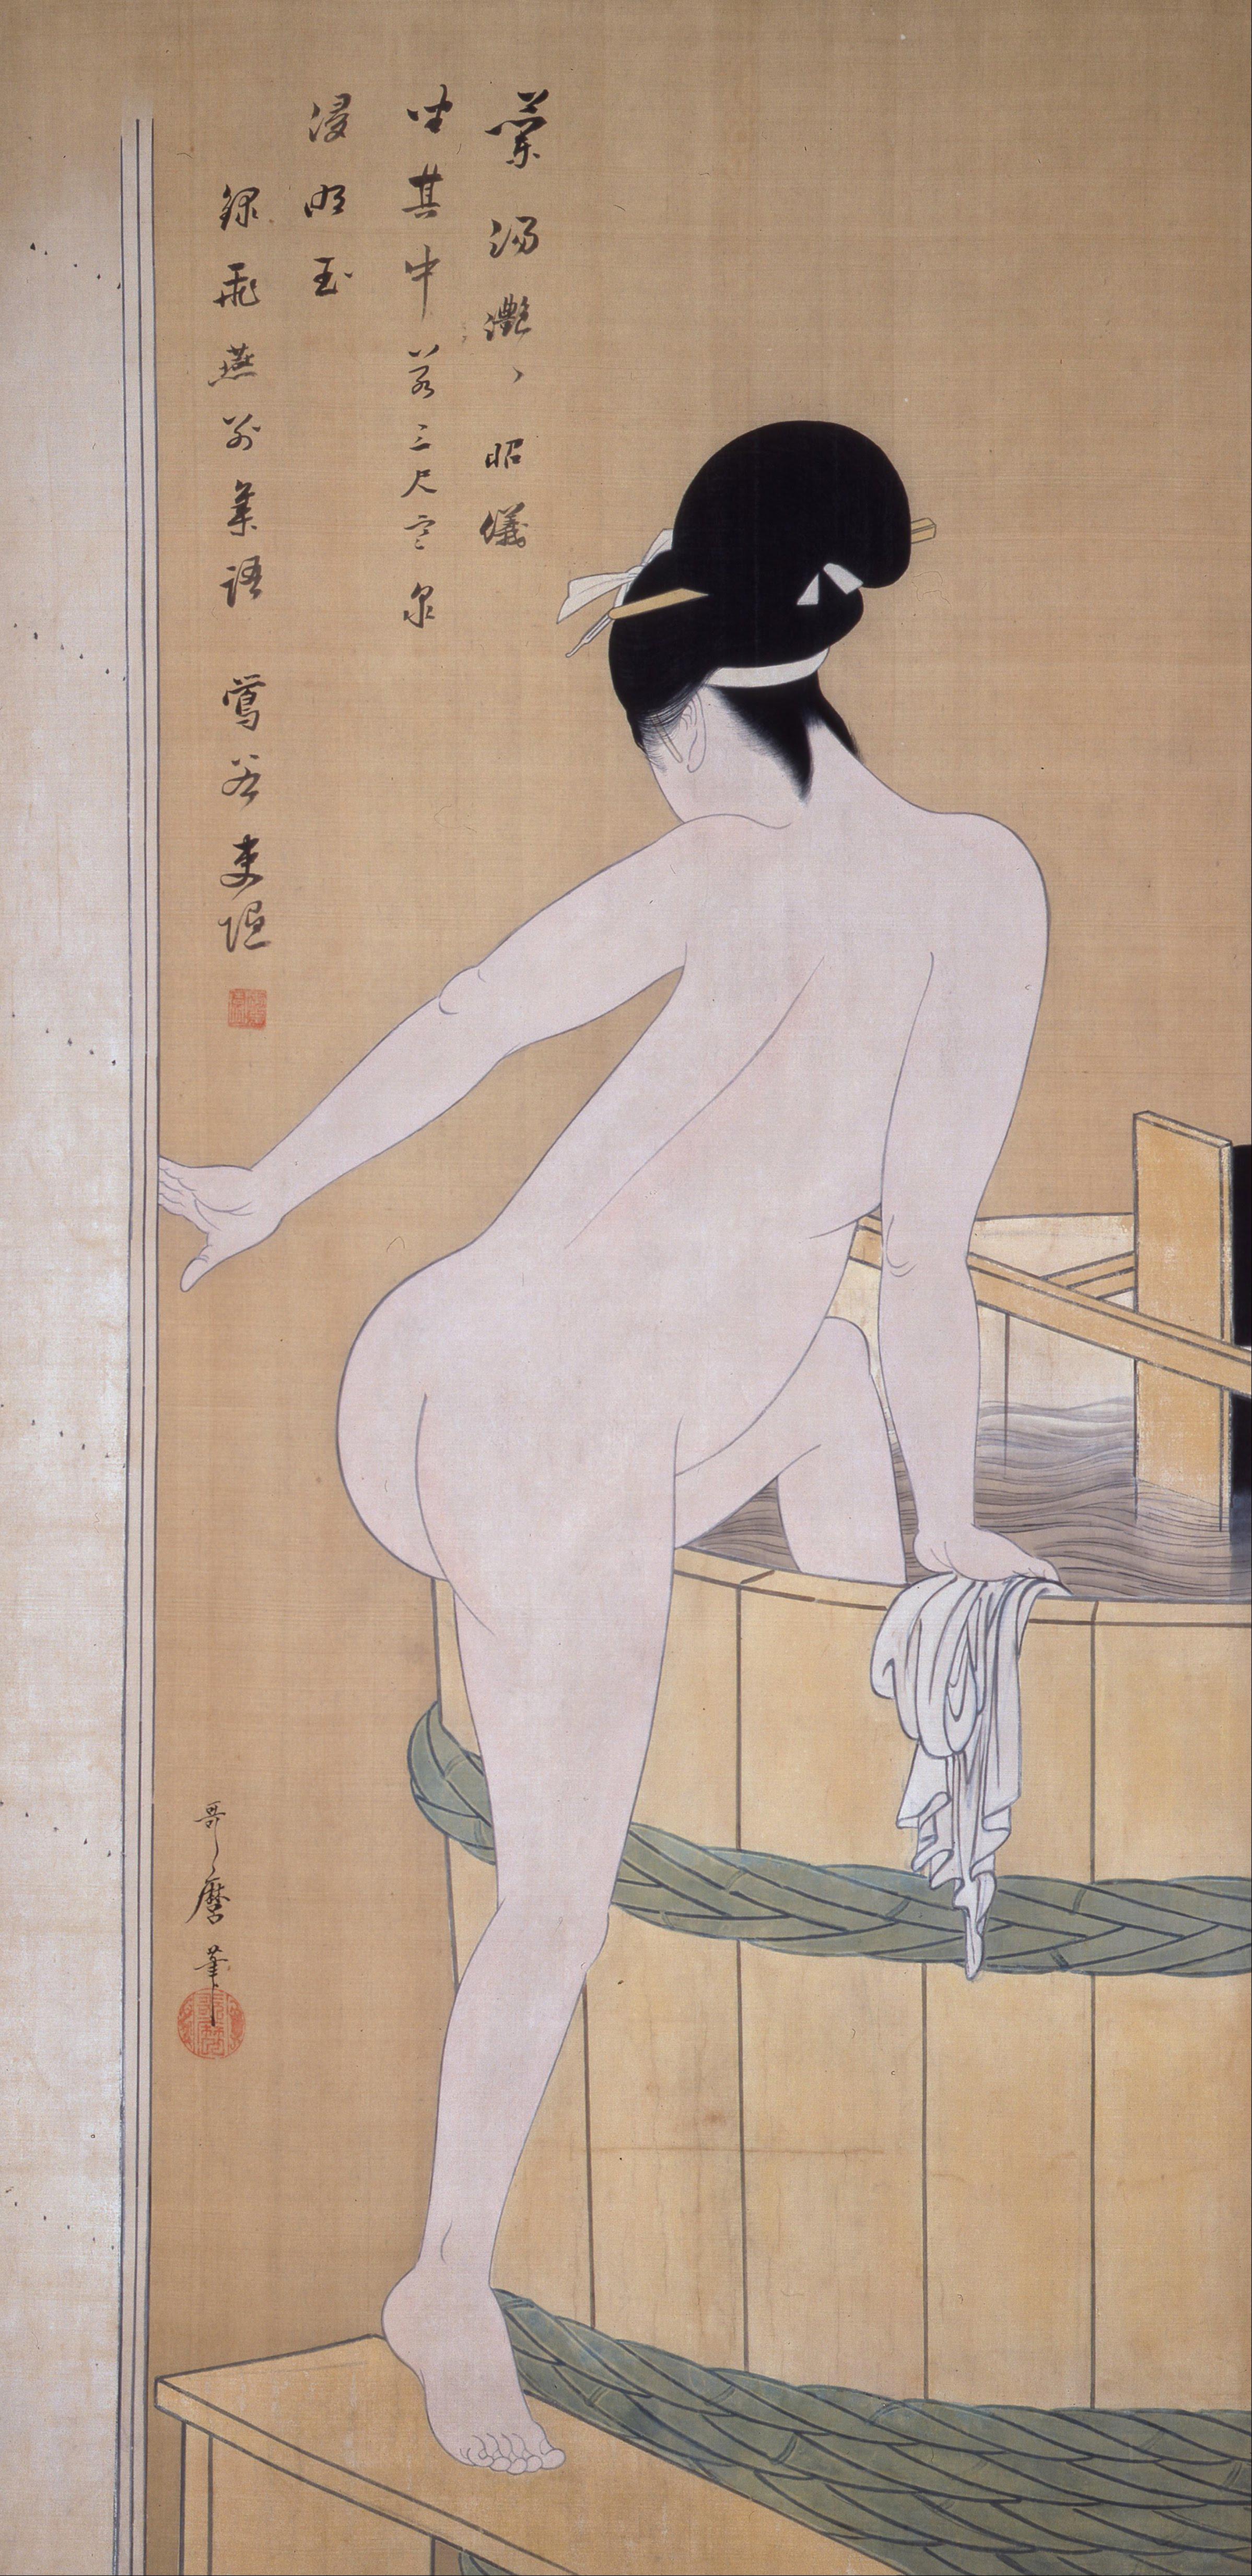 http://upload.wikimedia.org/wikipedia/commons/6/6b/Kitagawa_Utamaro_-_BATHING_IN_COLD_WATER_-_Google_Art_Project.jpg